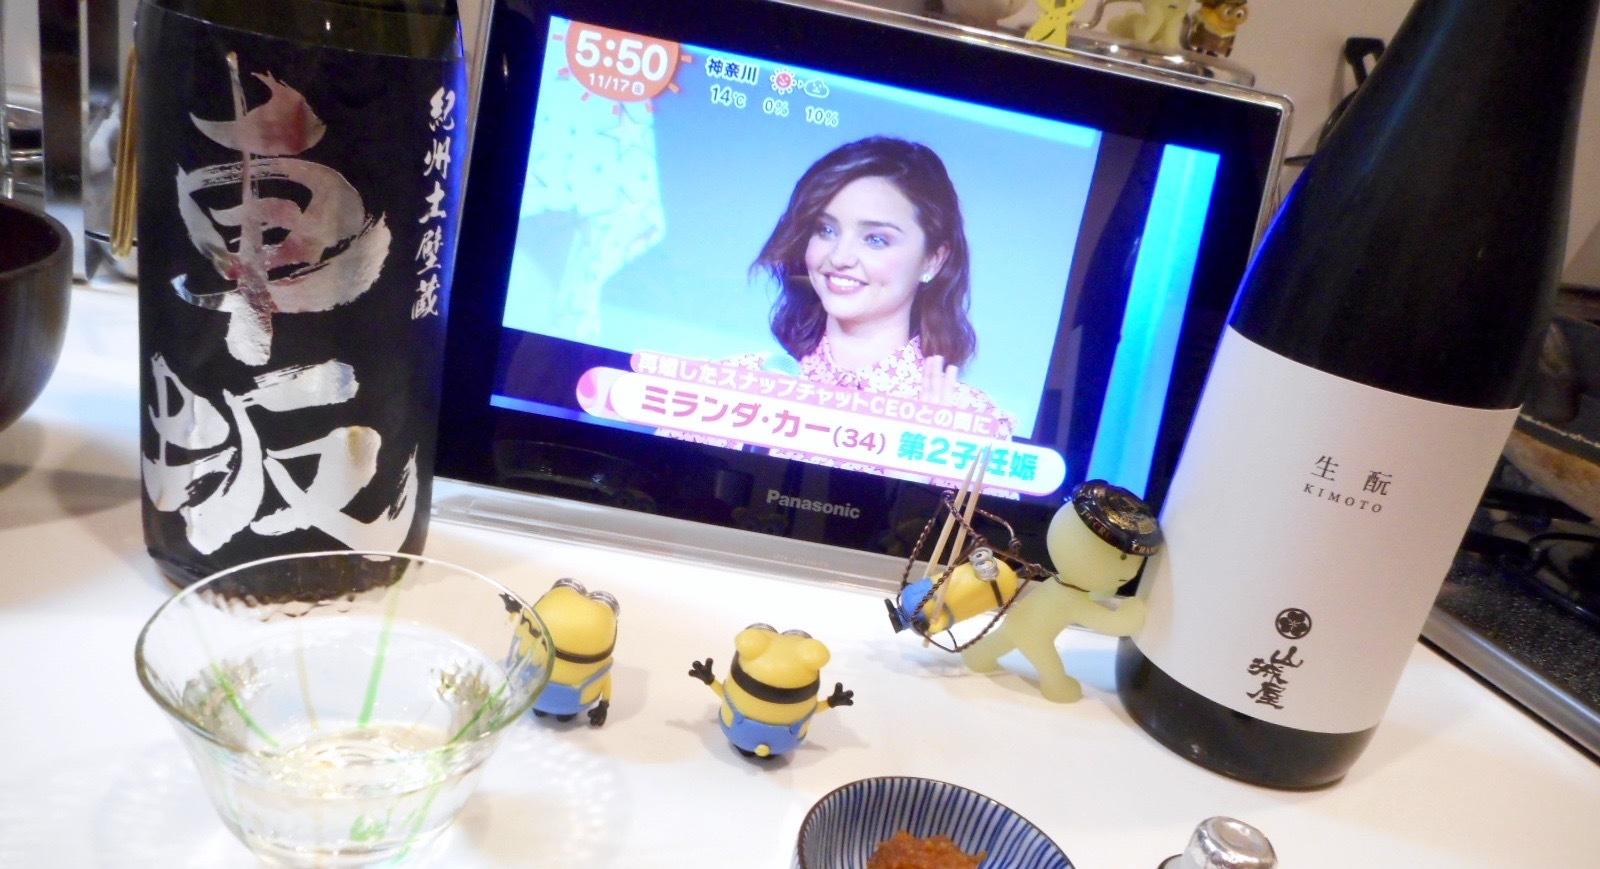 yamashiroya_kimoto28by4.jpg